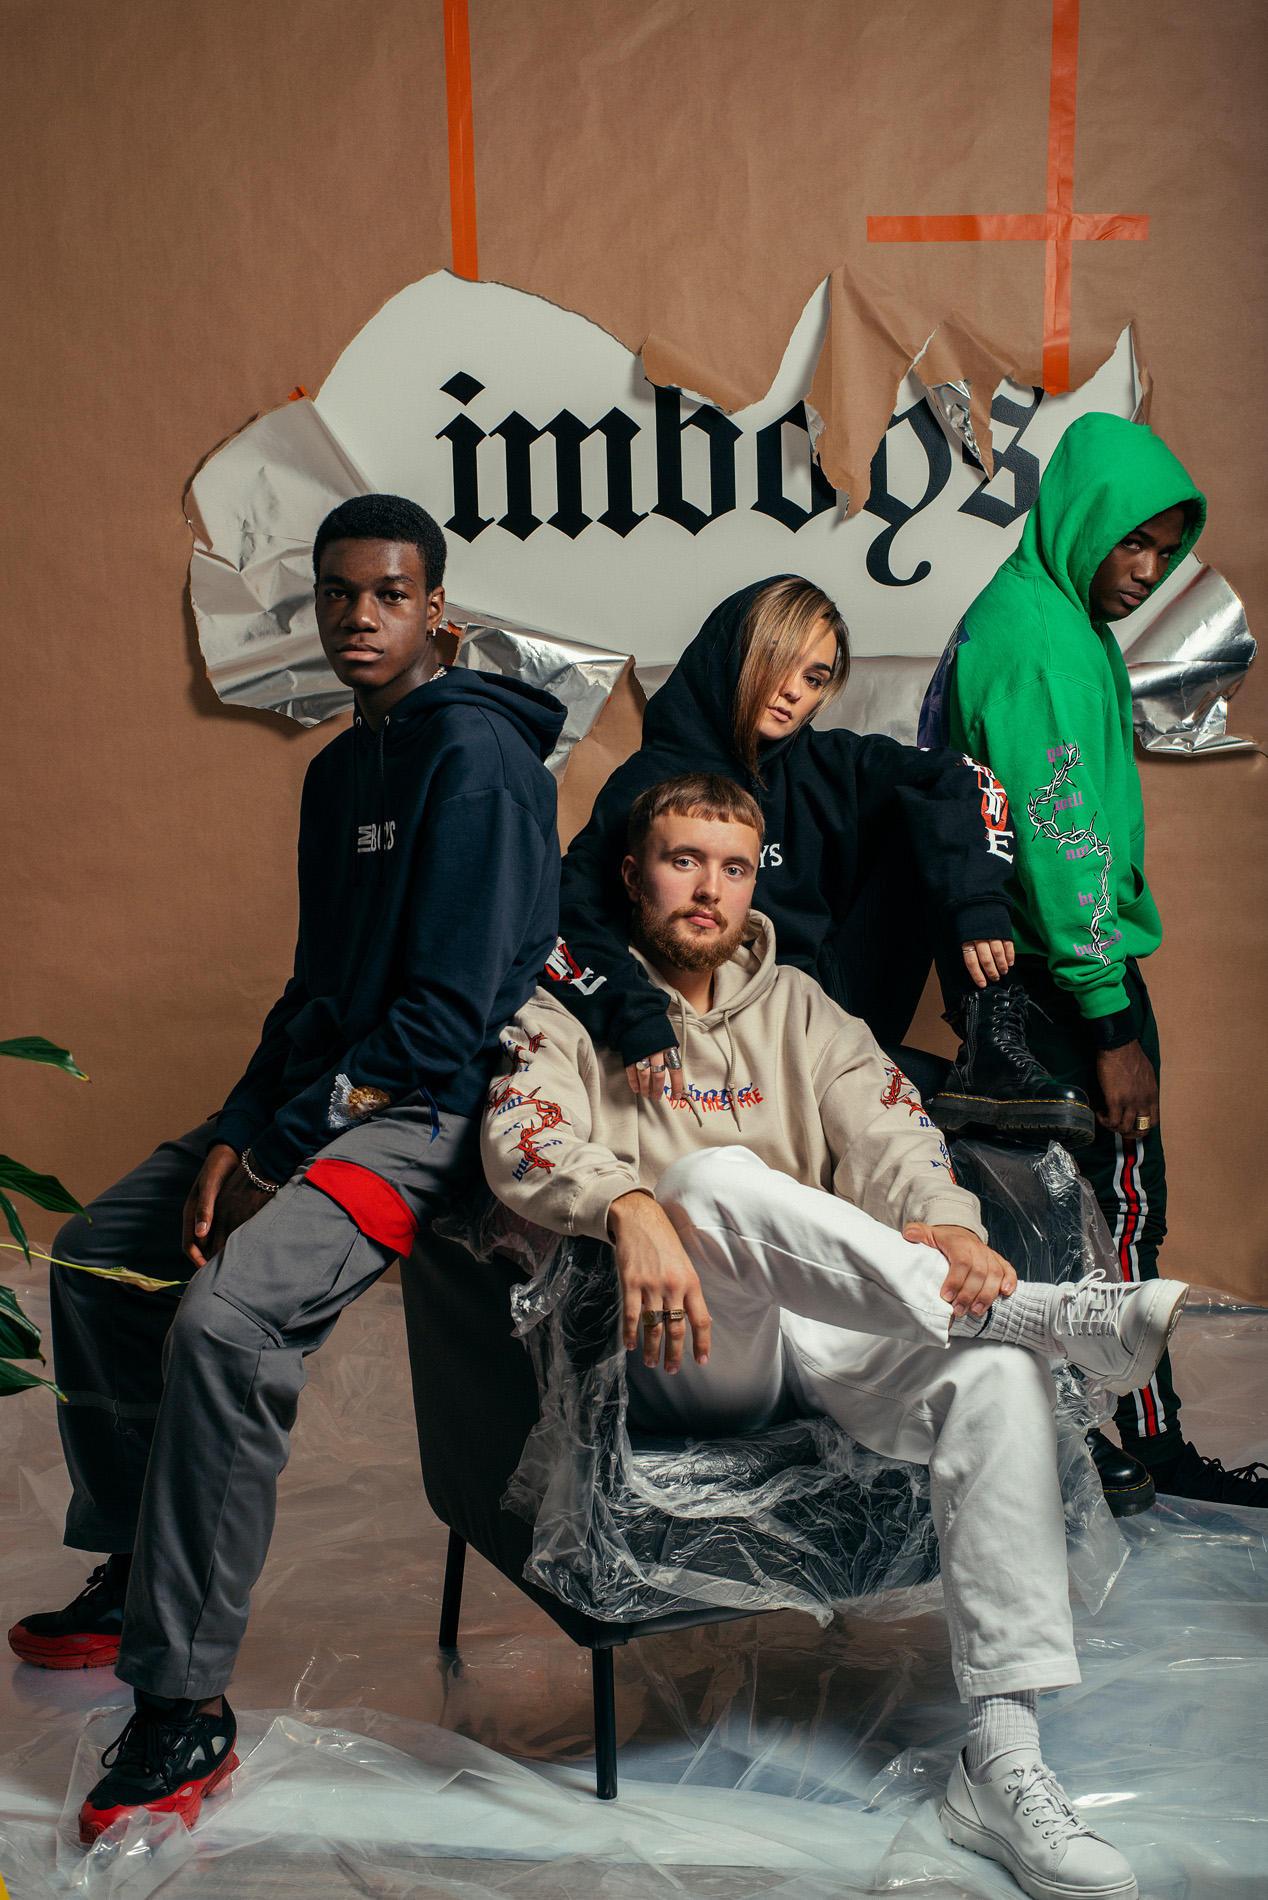 Imboys